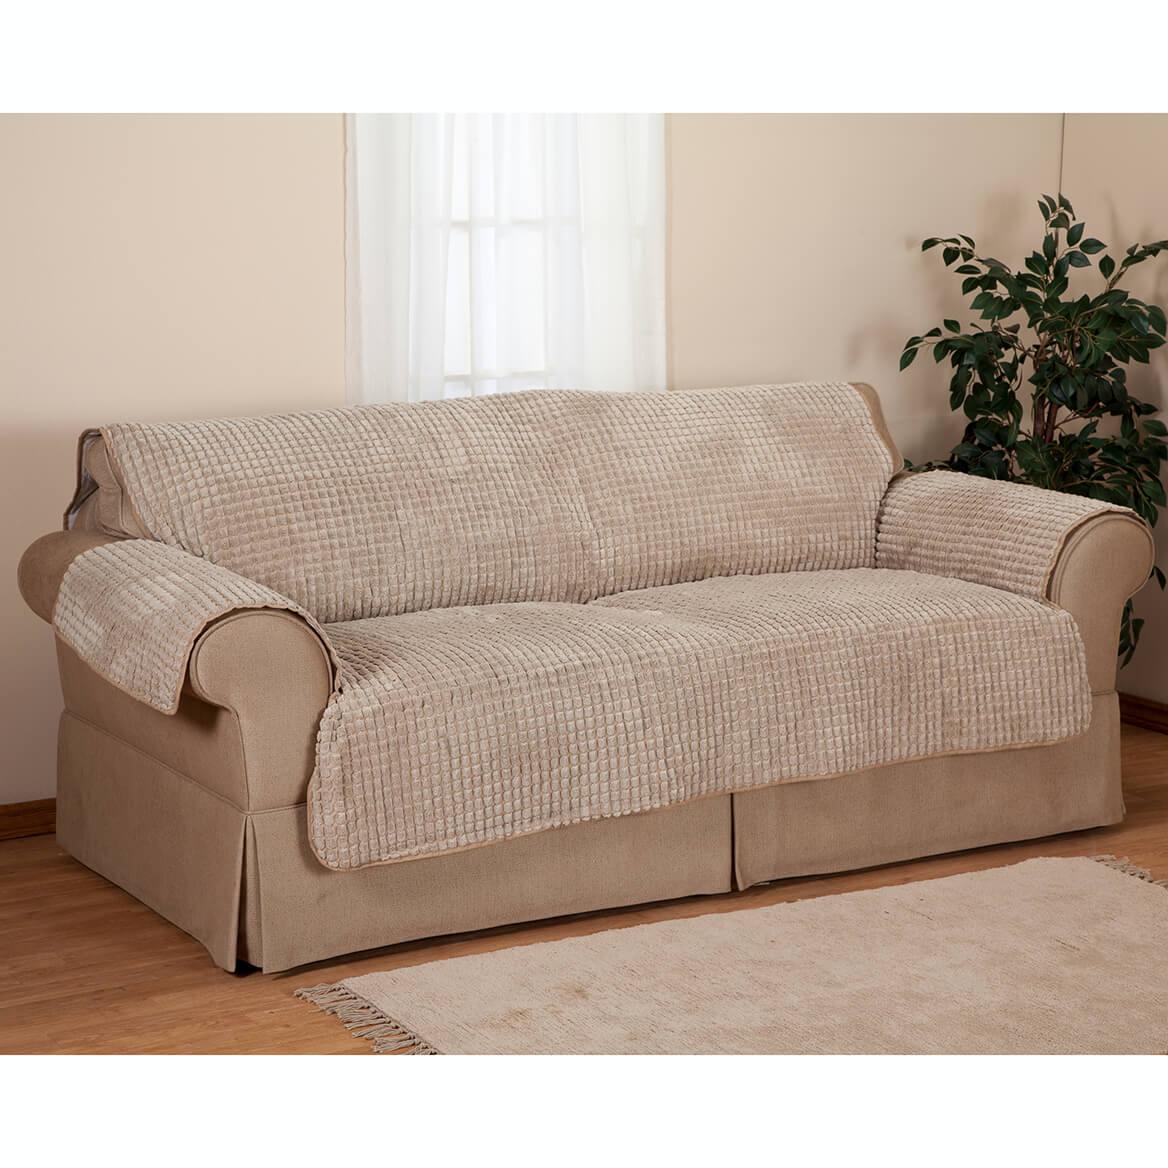 Puff Loveseat Furniture Protector-349610